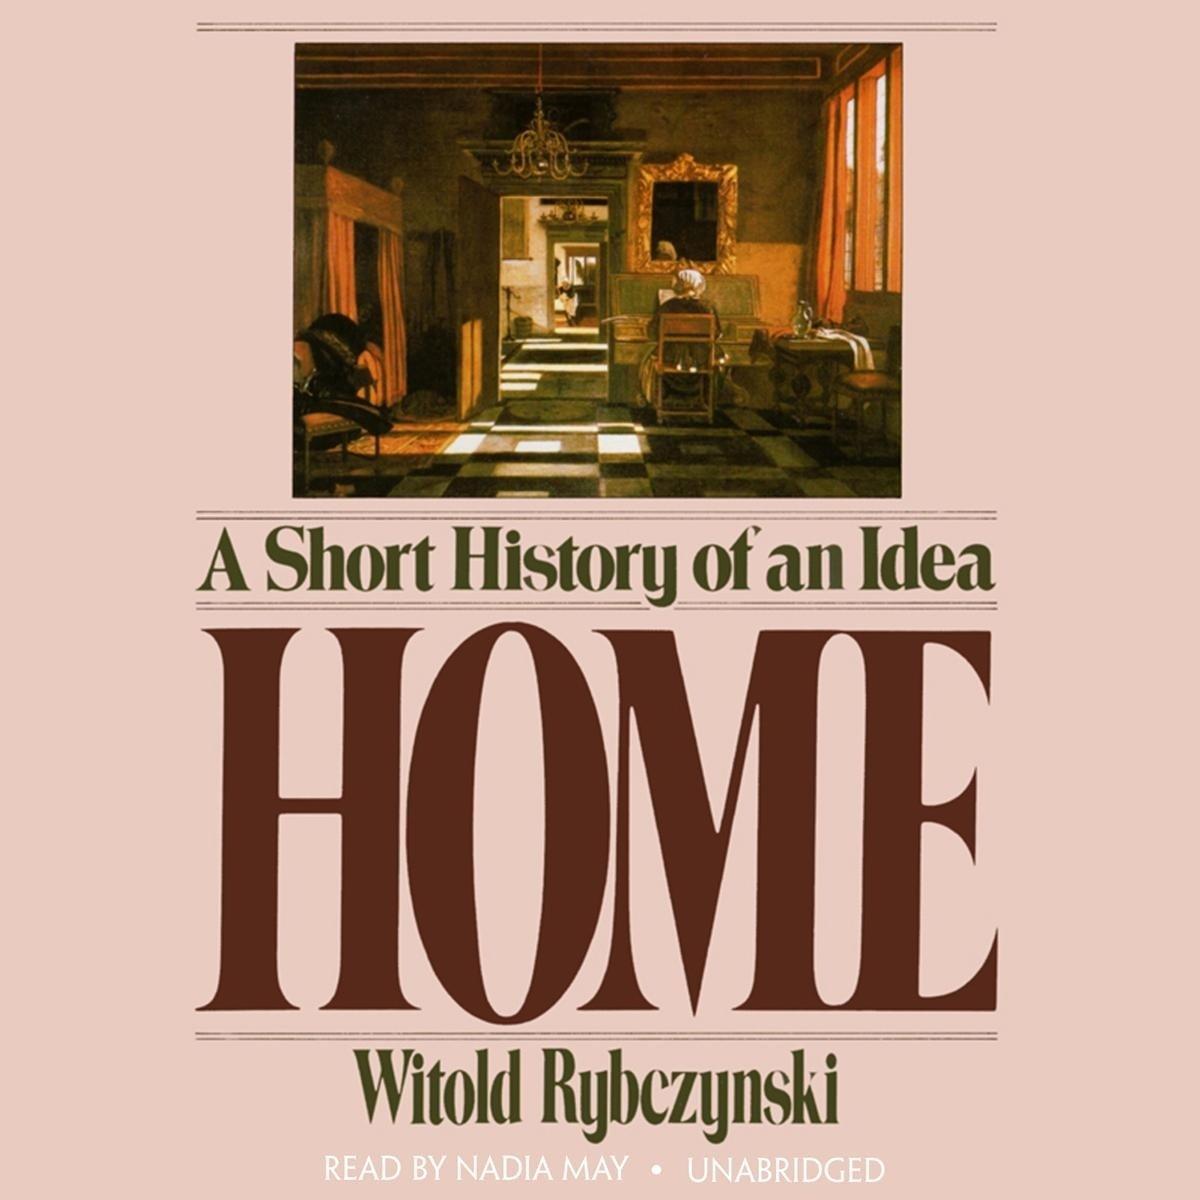 10 Gorgeous Home A Short History Of An Idea home audiobookwitold rybczynski 9781481574402 rakuten kobo 2020